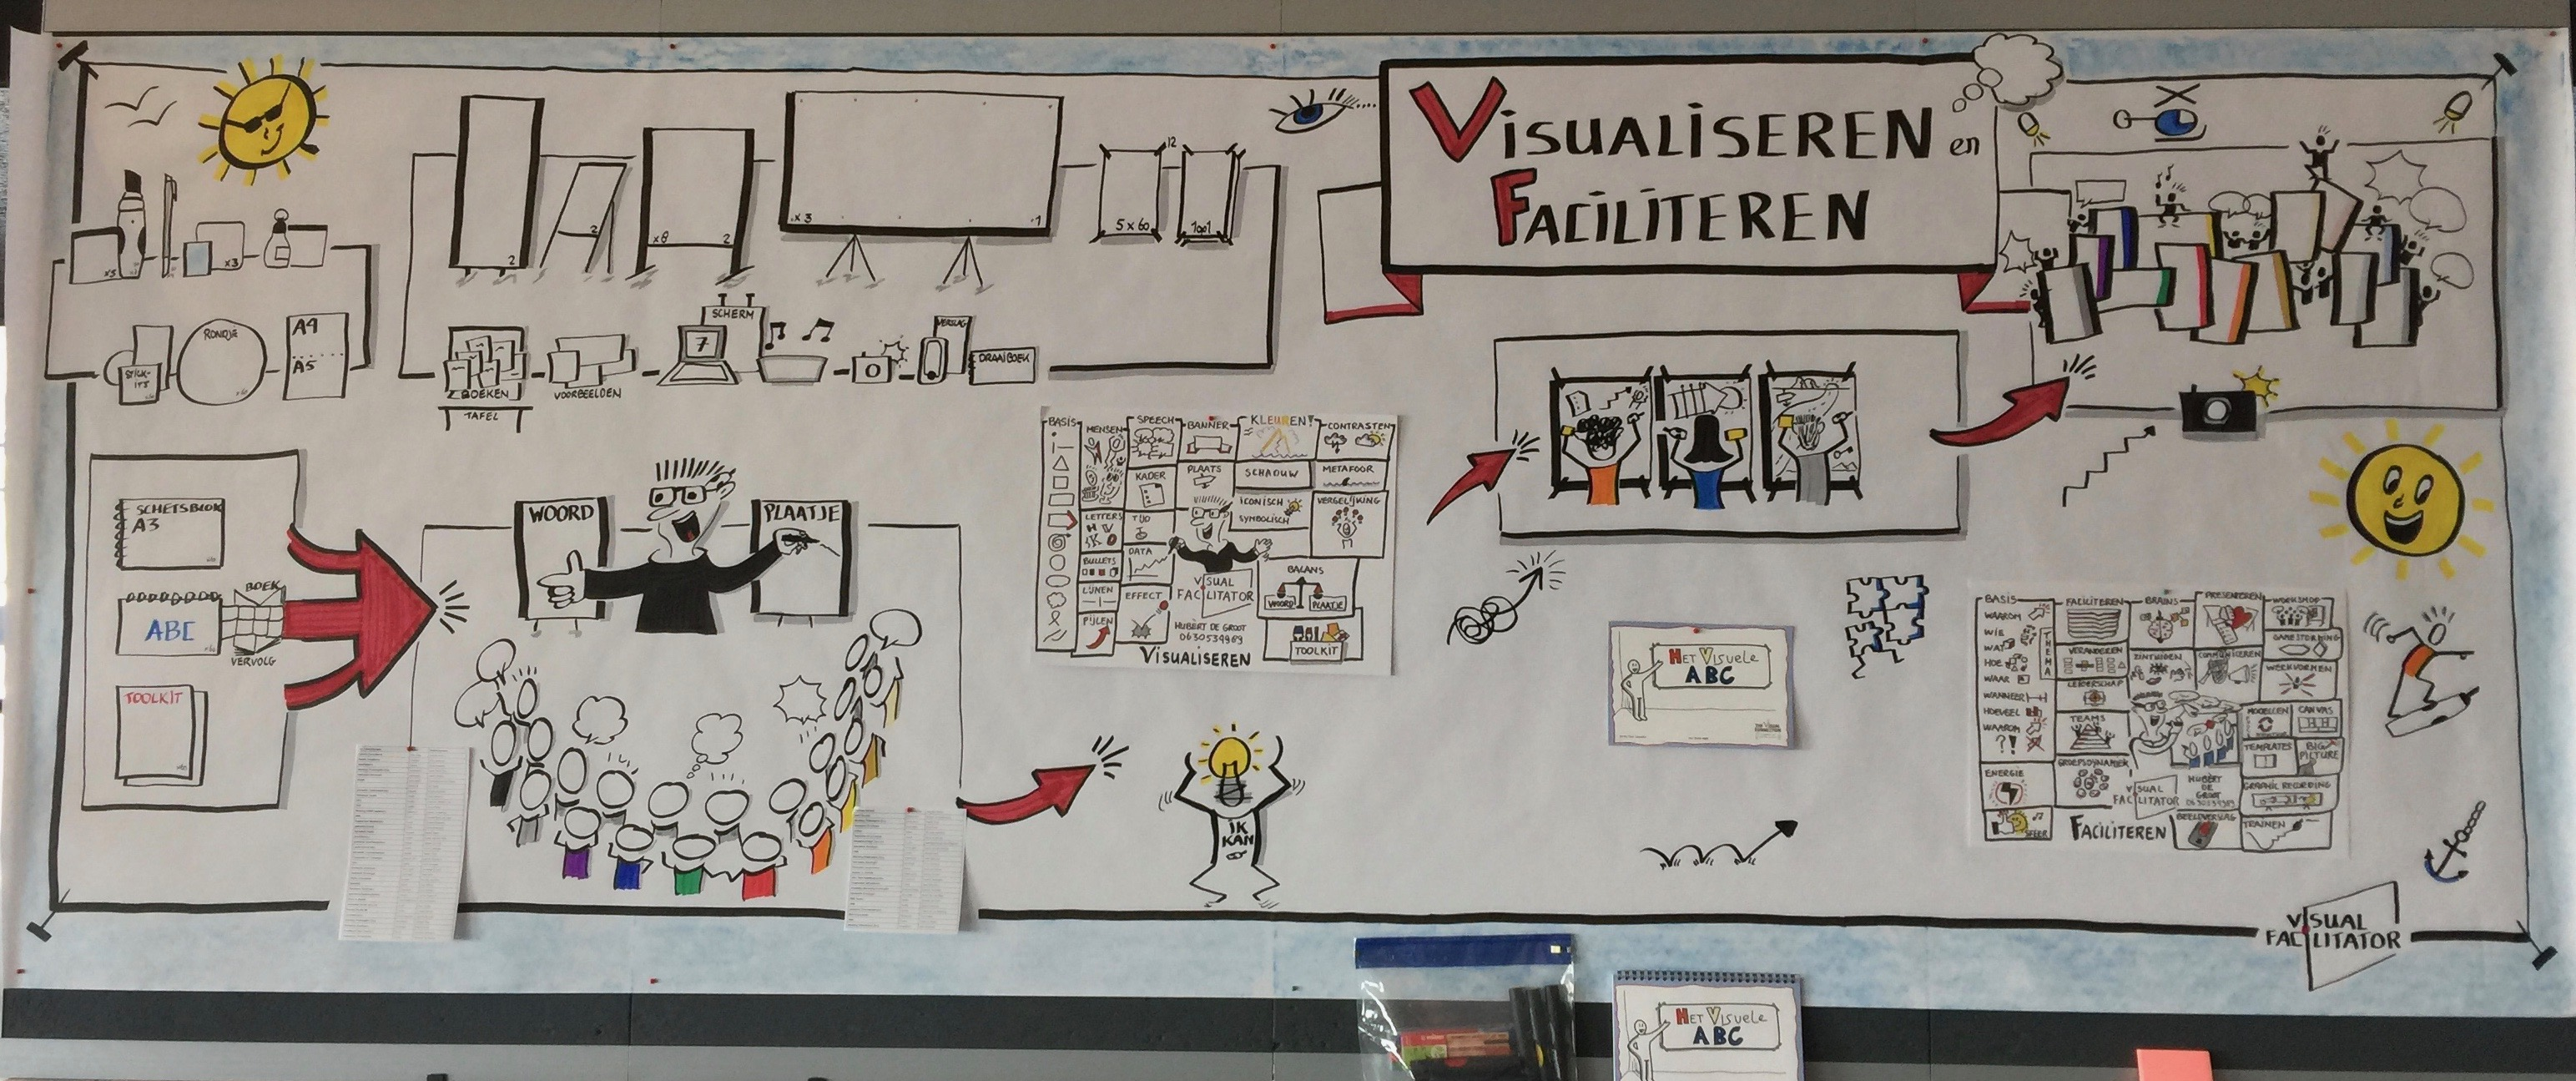 Training People Facilitation and Visualization